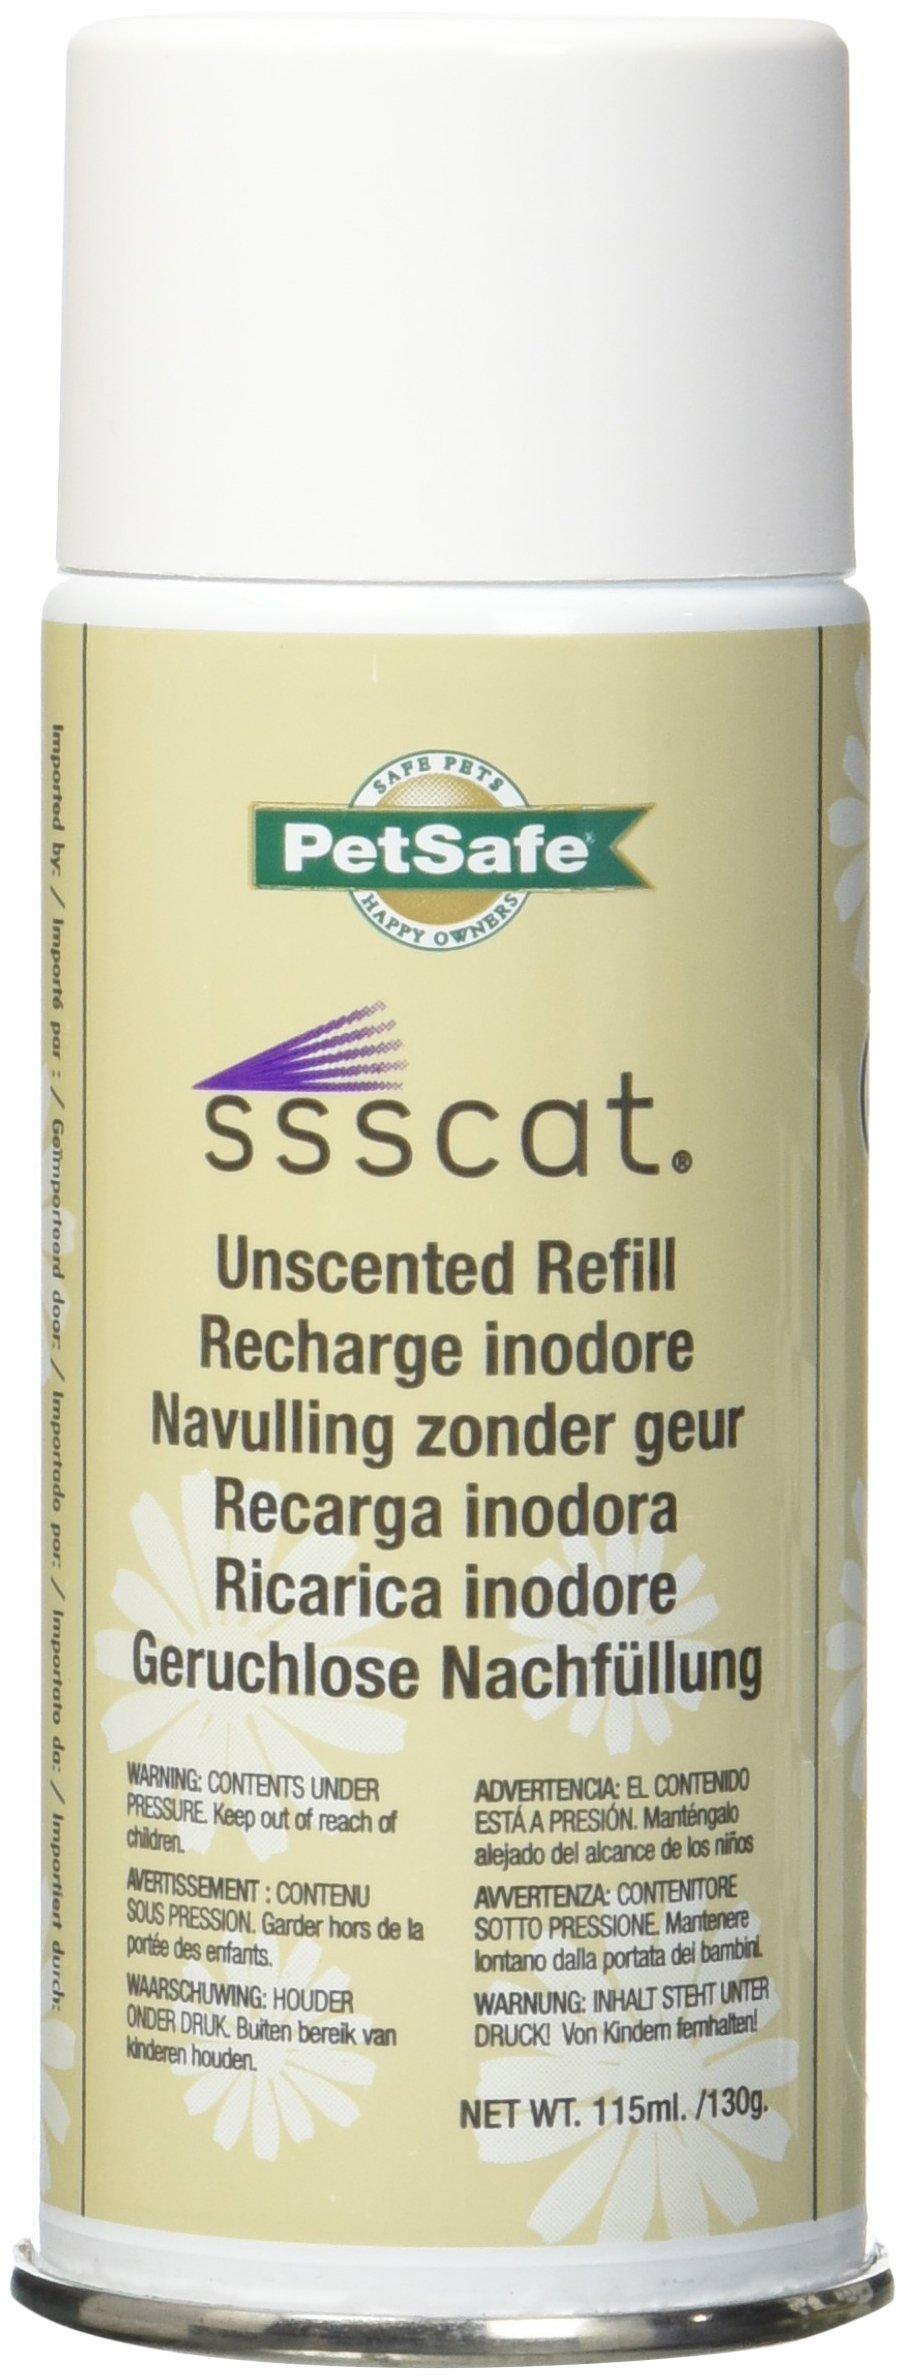 Petsafe Ssscat Repellent Deterrent Refills. 3 Pack. by PetSafe